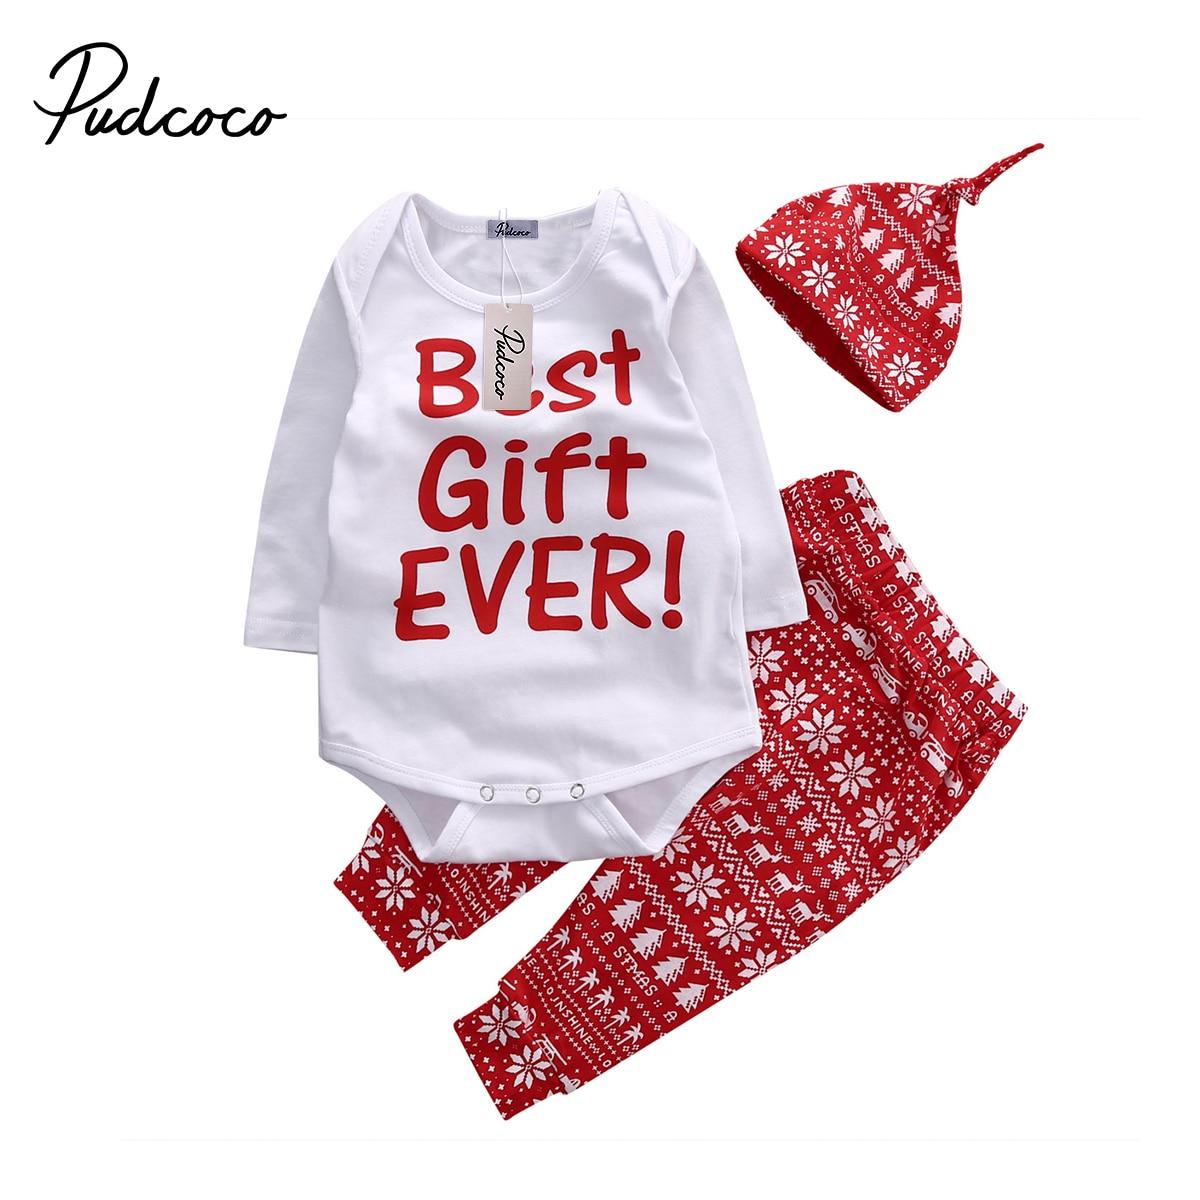 2018 Christmas Snowflake Baby Kids Girls Boys Xmas Long Sleeve Bodysuit Top+Pant+Hat NewYear Clothes Set 0-18M